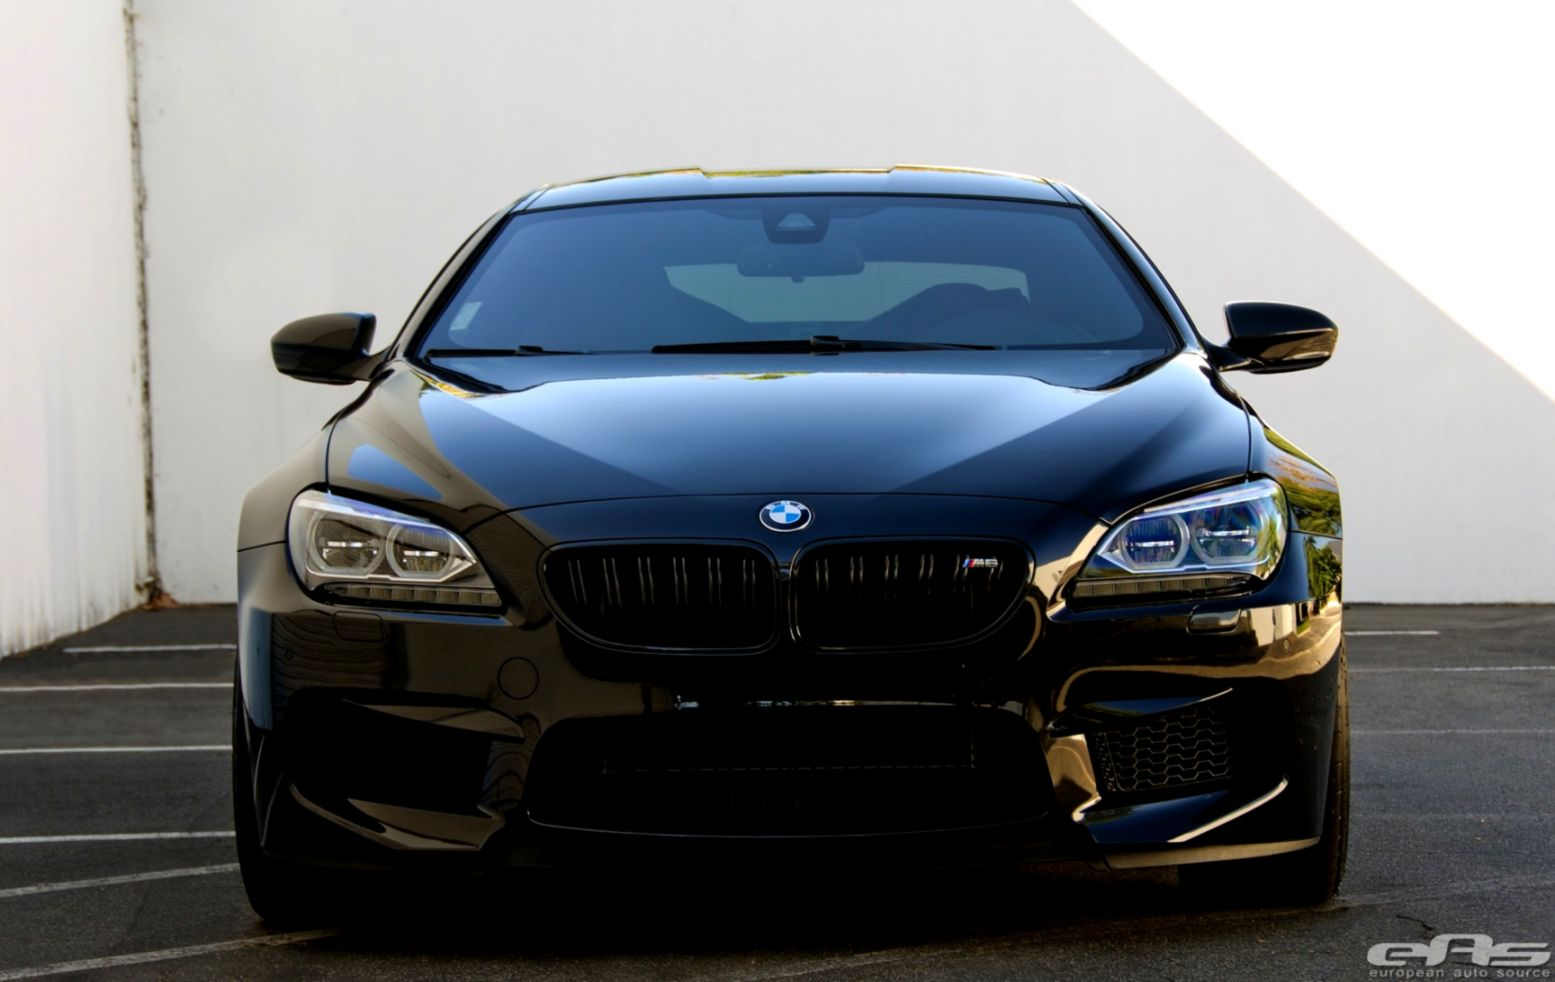 Bmw M6 Coupe F13 Black Tuning Car Rear Hd Wallpaper ...